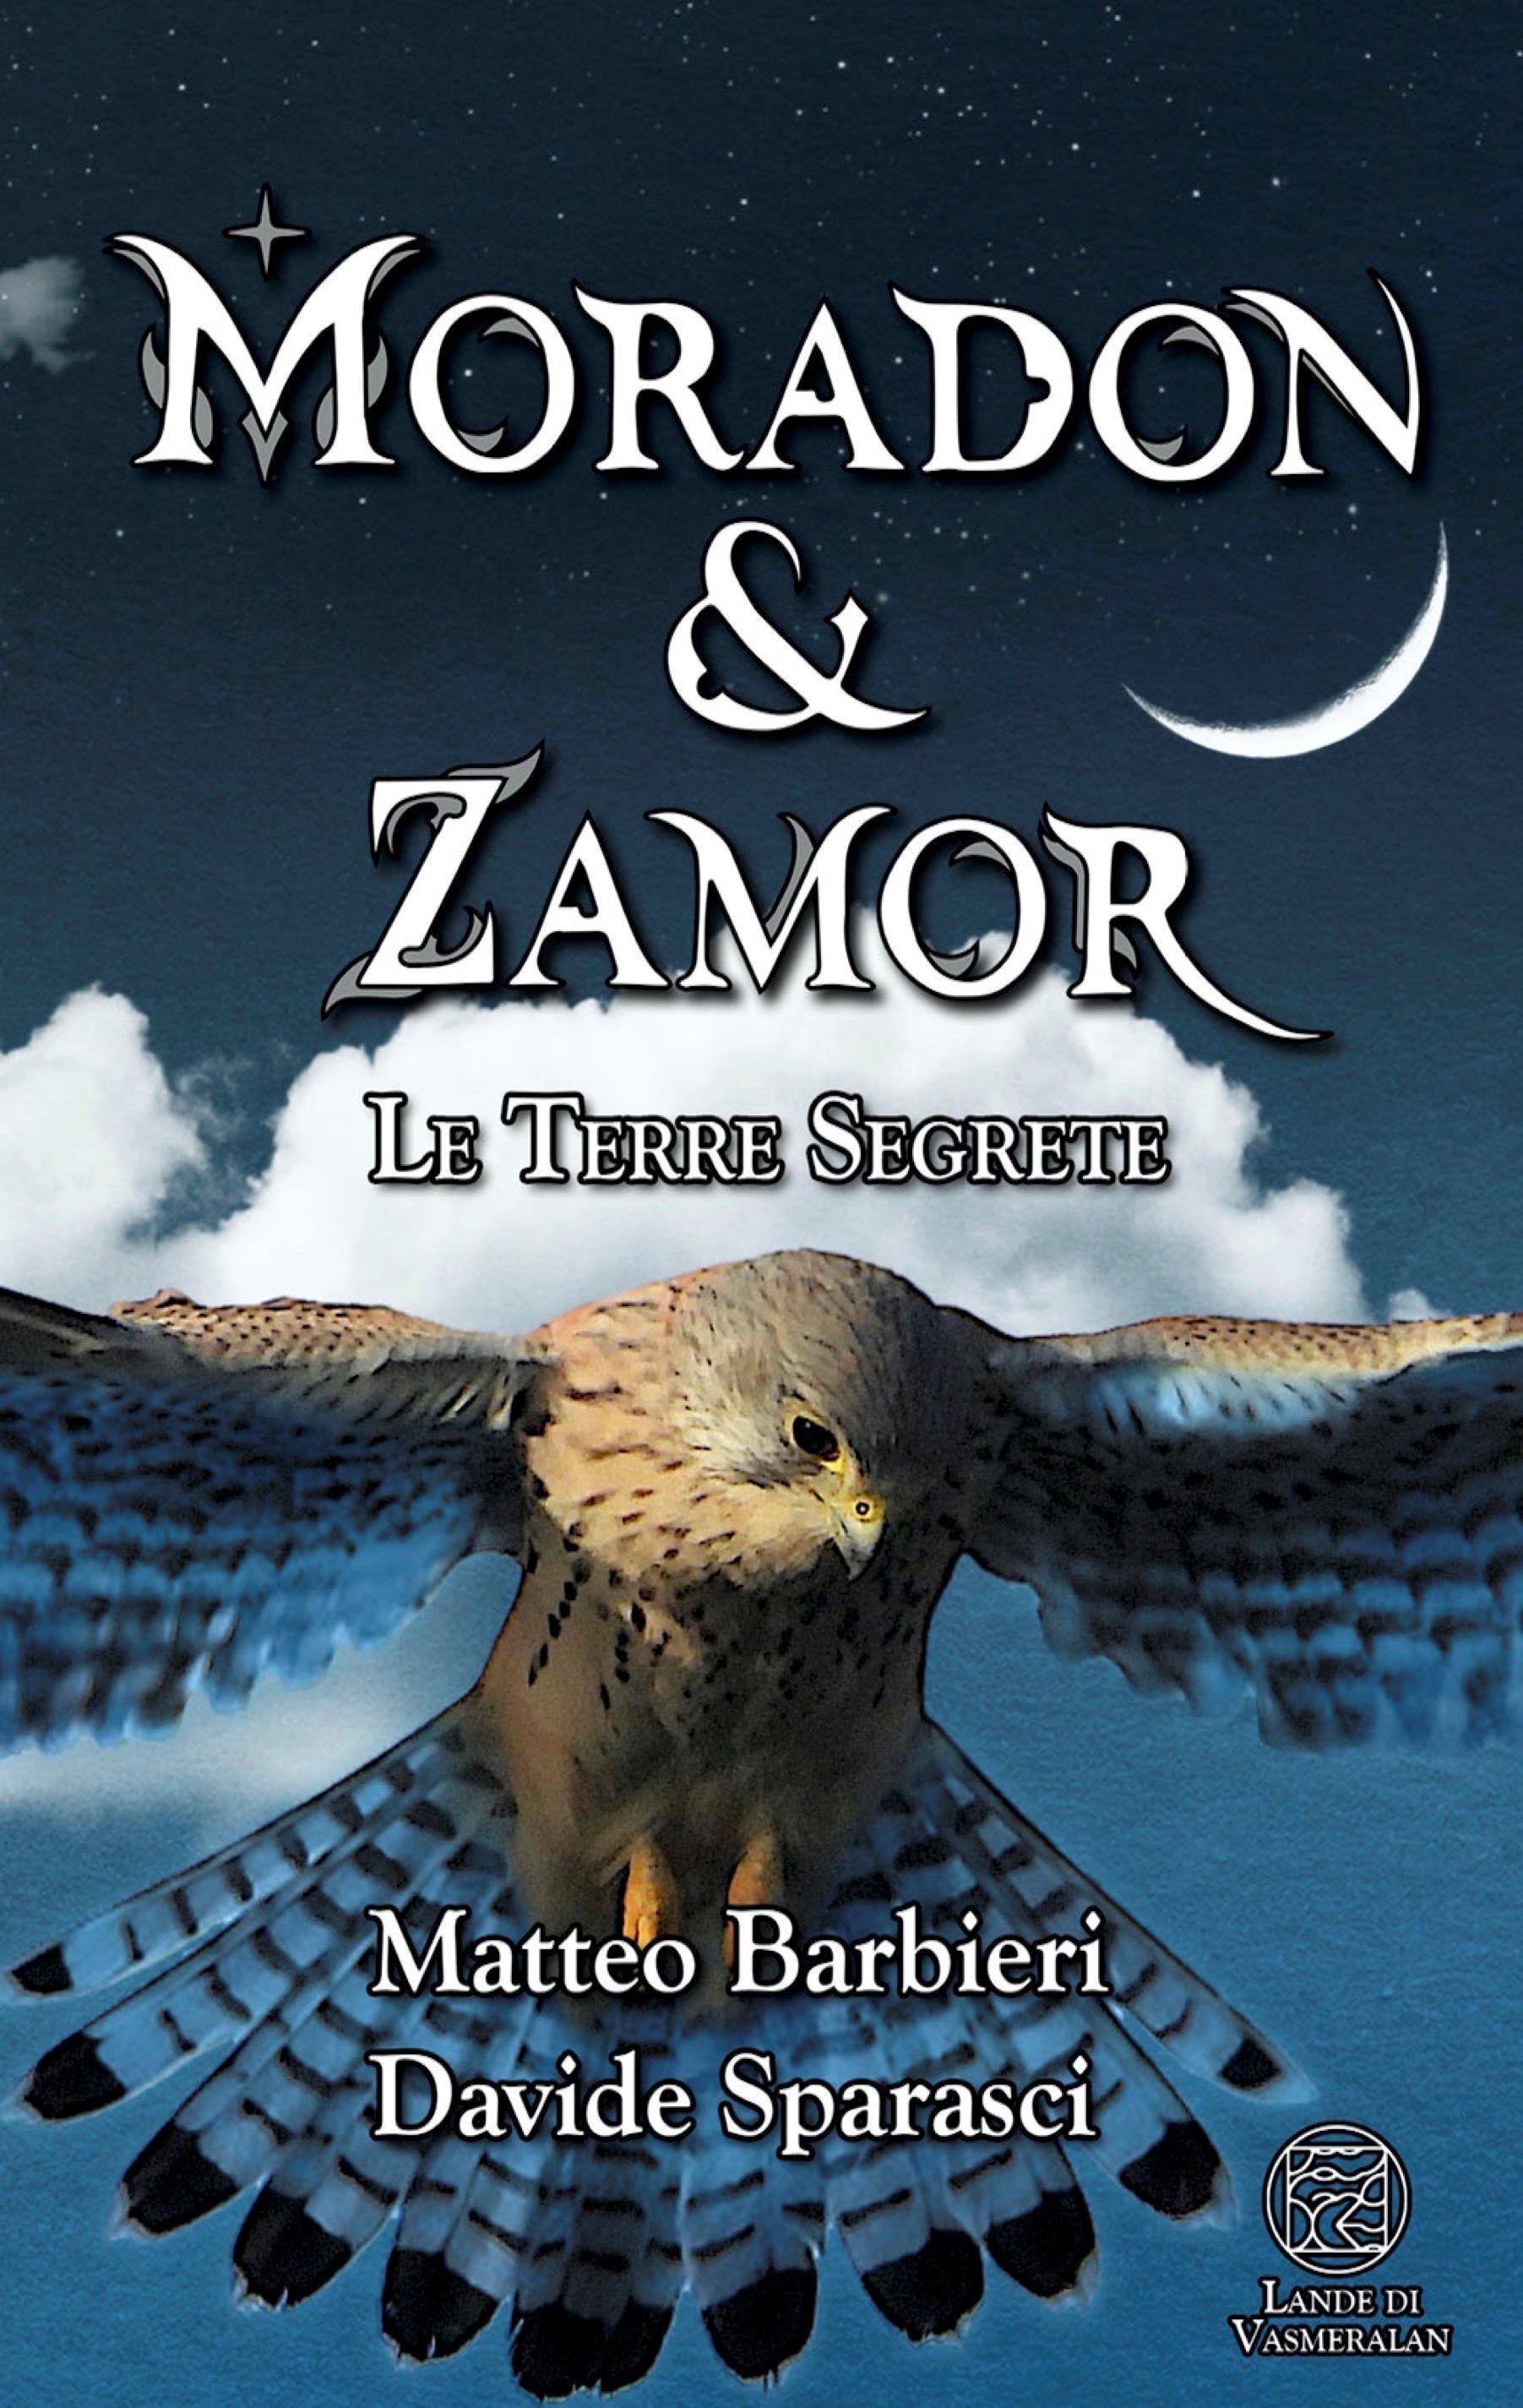 Moradon & Zamor. Le Terre Segrete